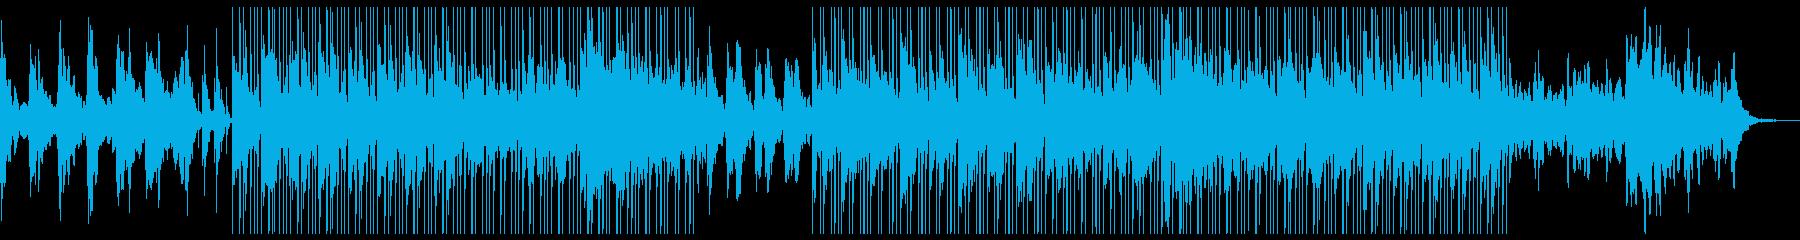 Lofi ノスタルジック 古いオルゴールの再生済みの波形